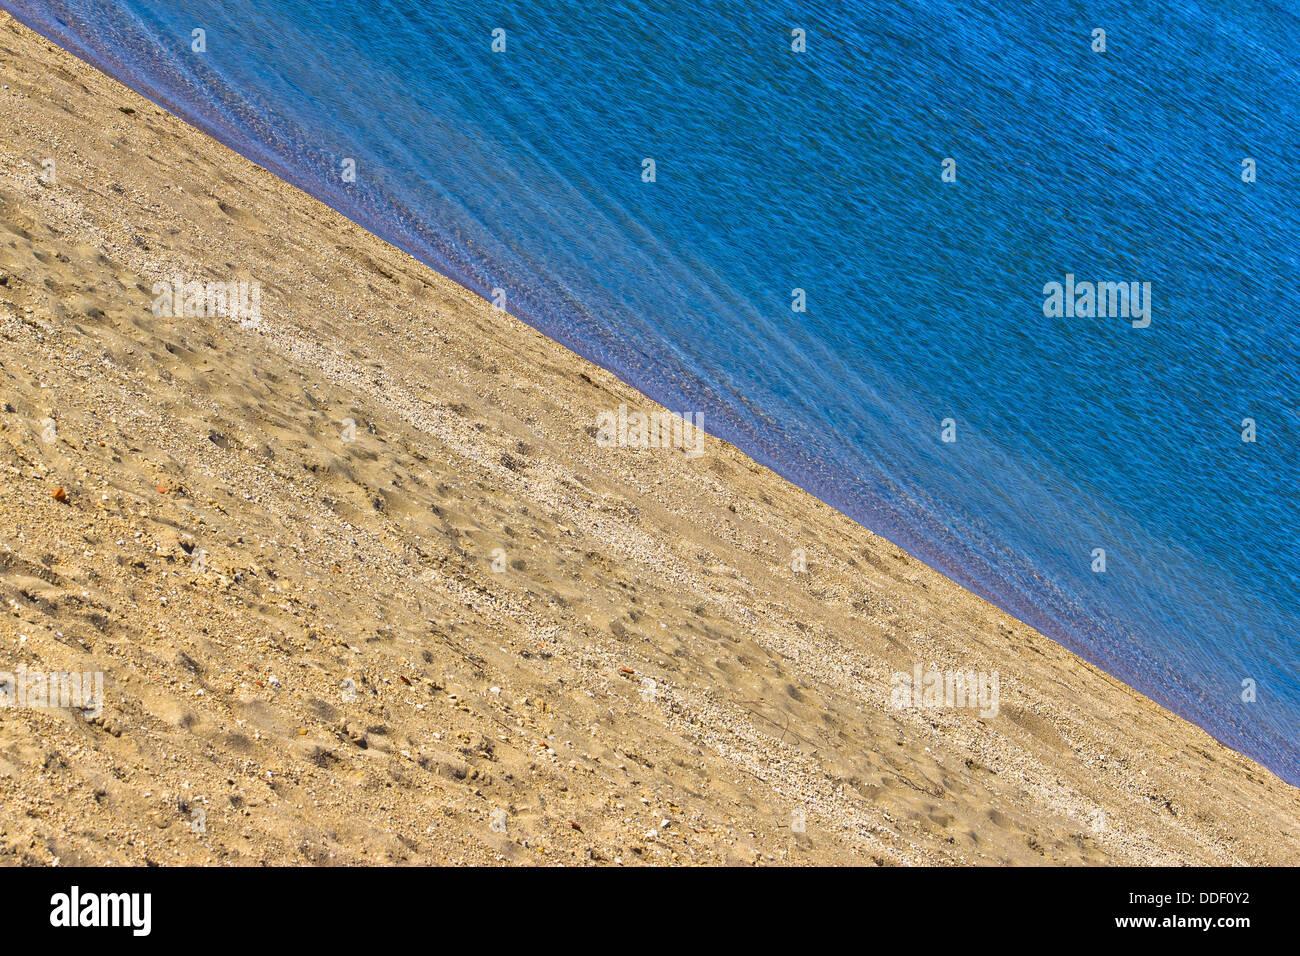 Sand beach and blue sea diagonal layers - Stock Image